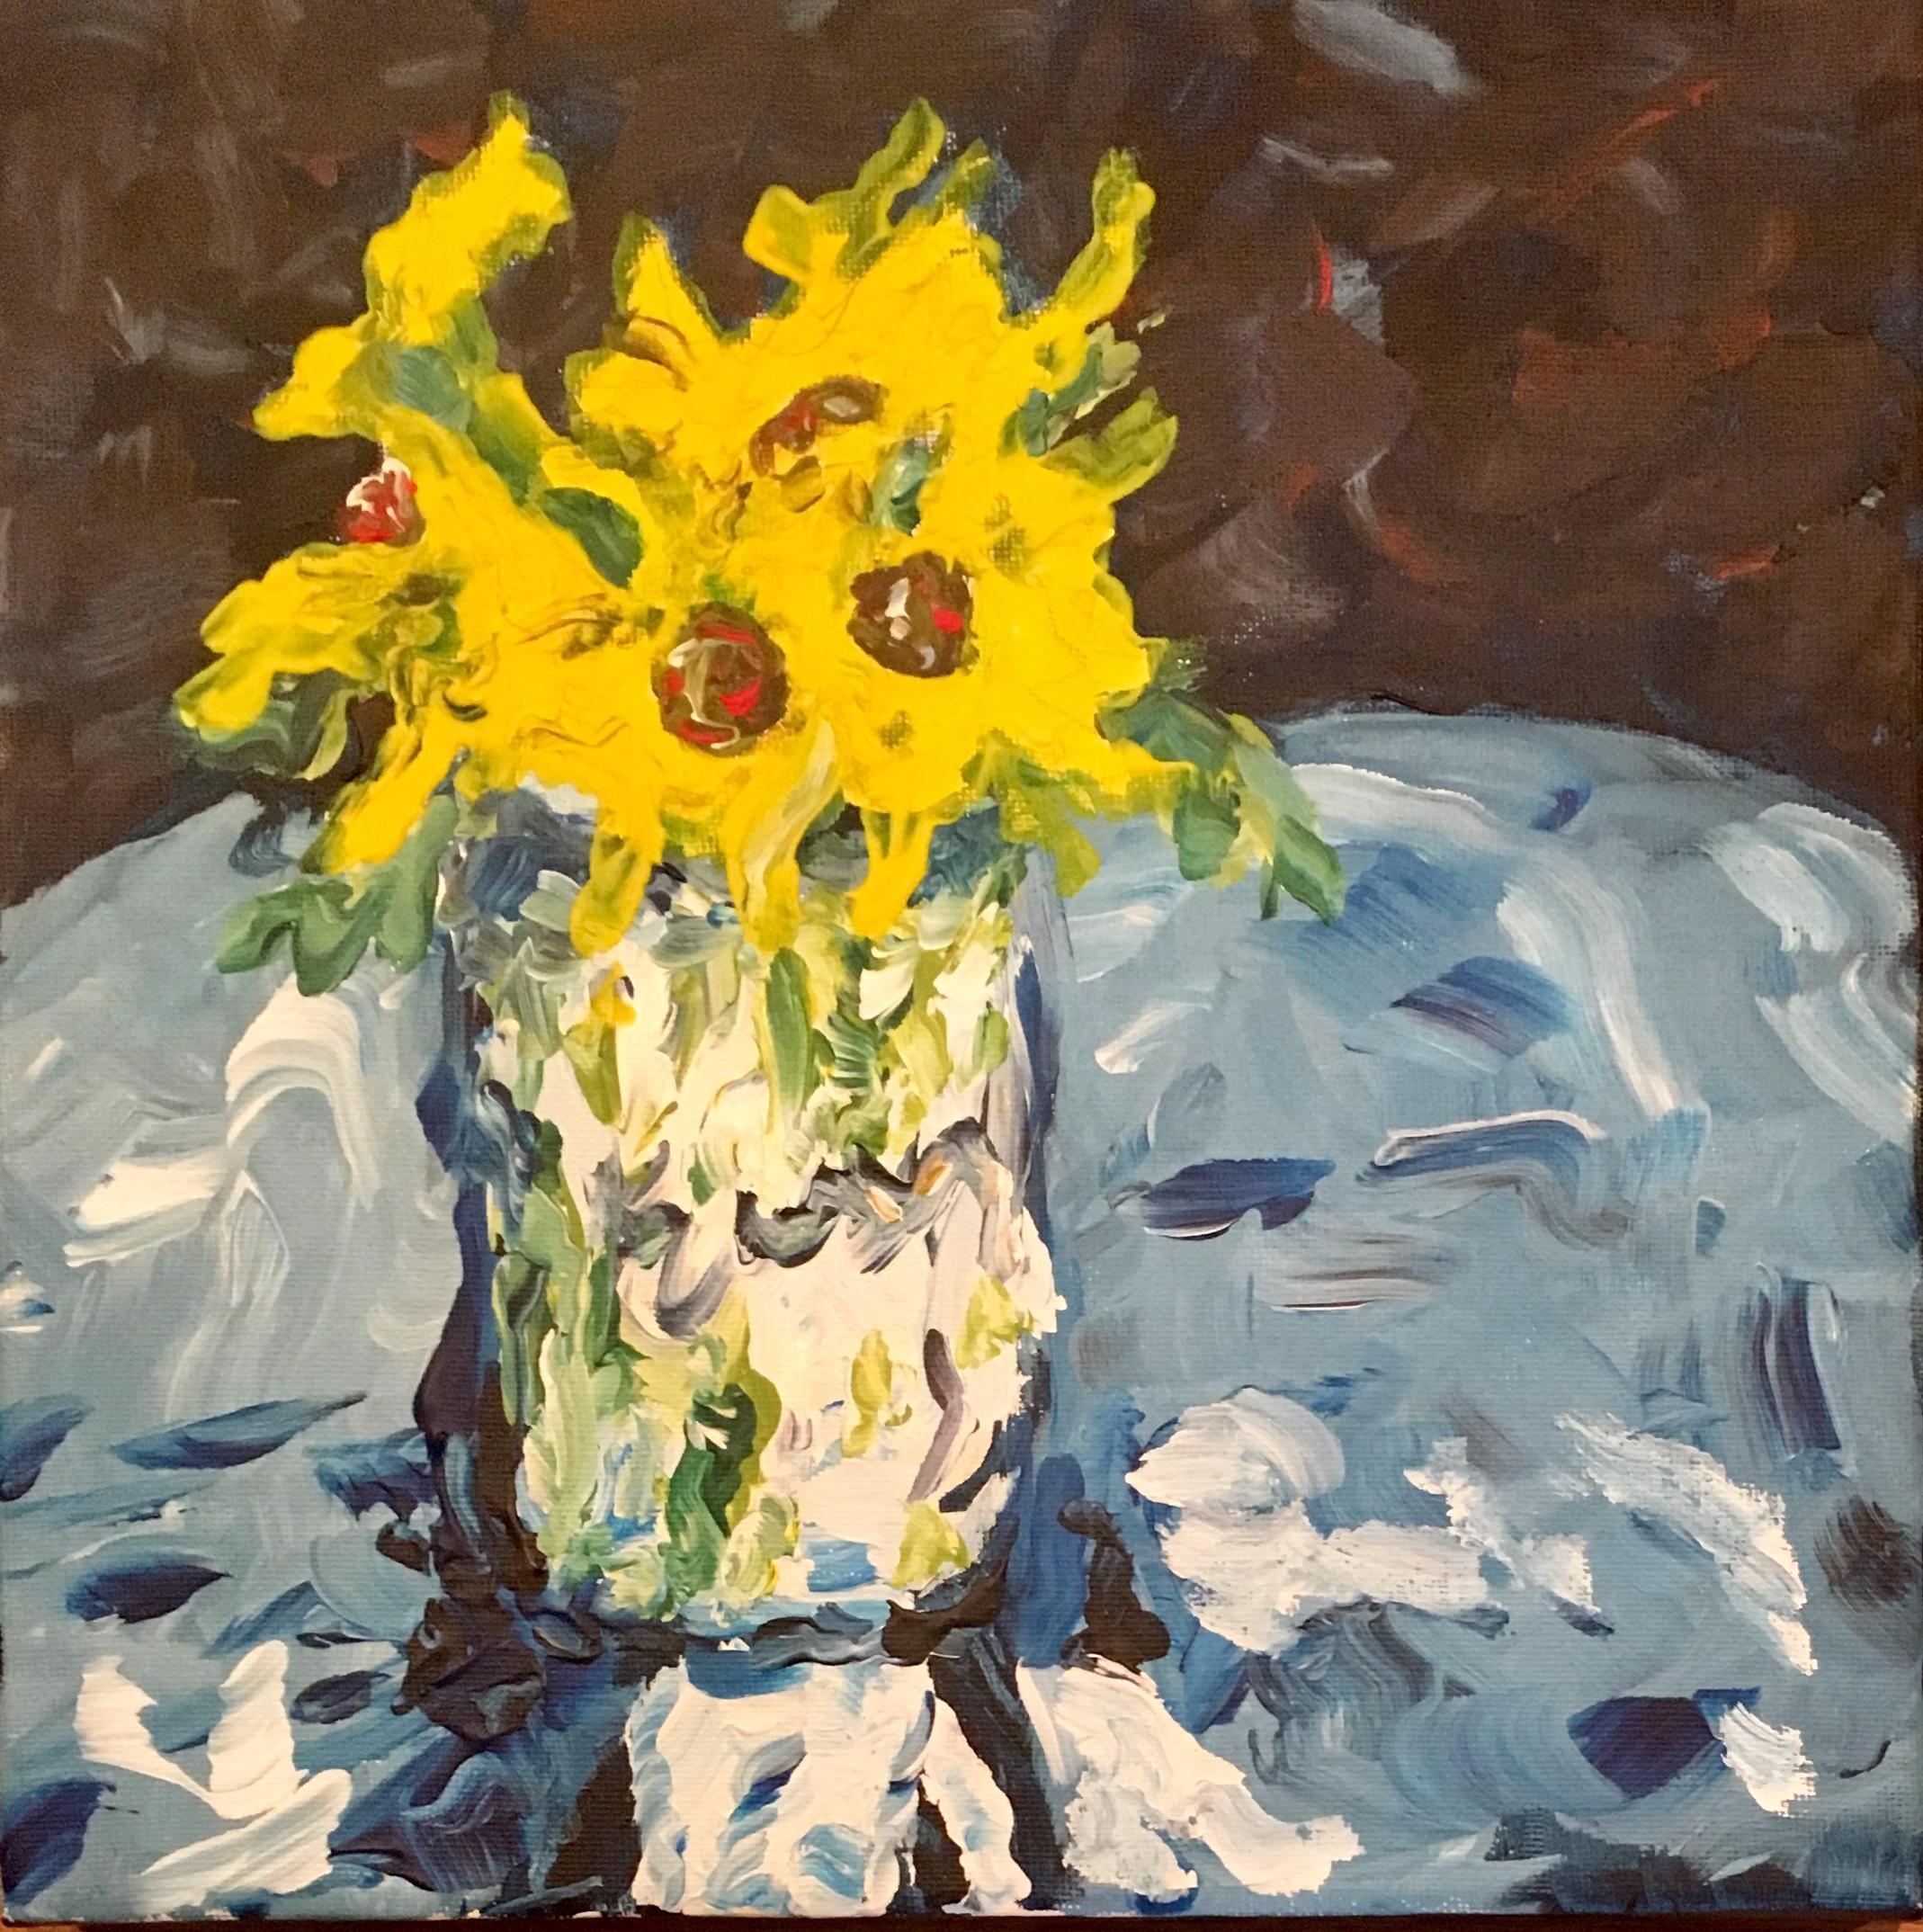 Yellow Flowers no. 1, $50/print